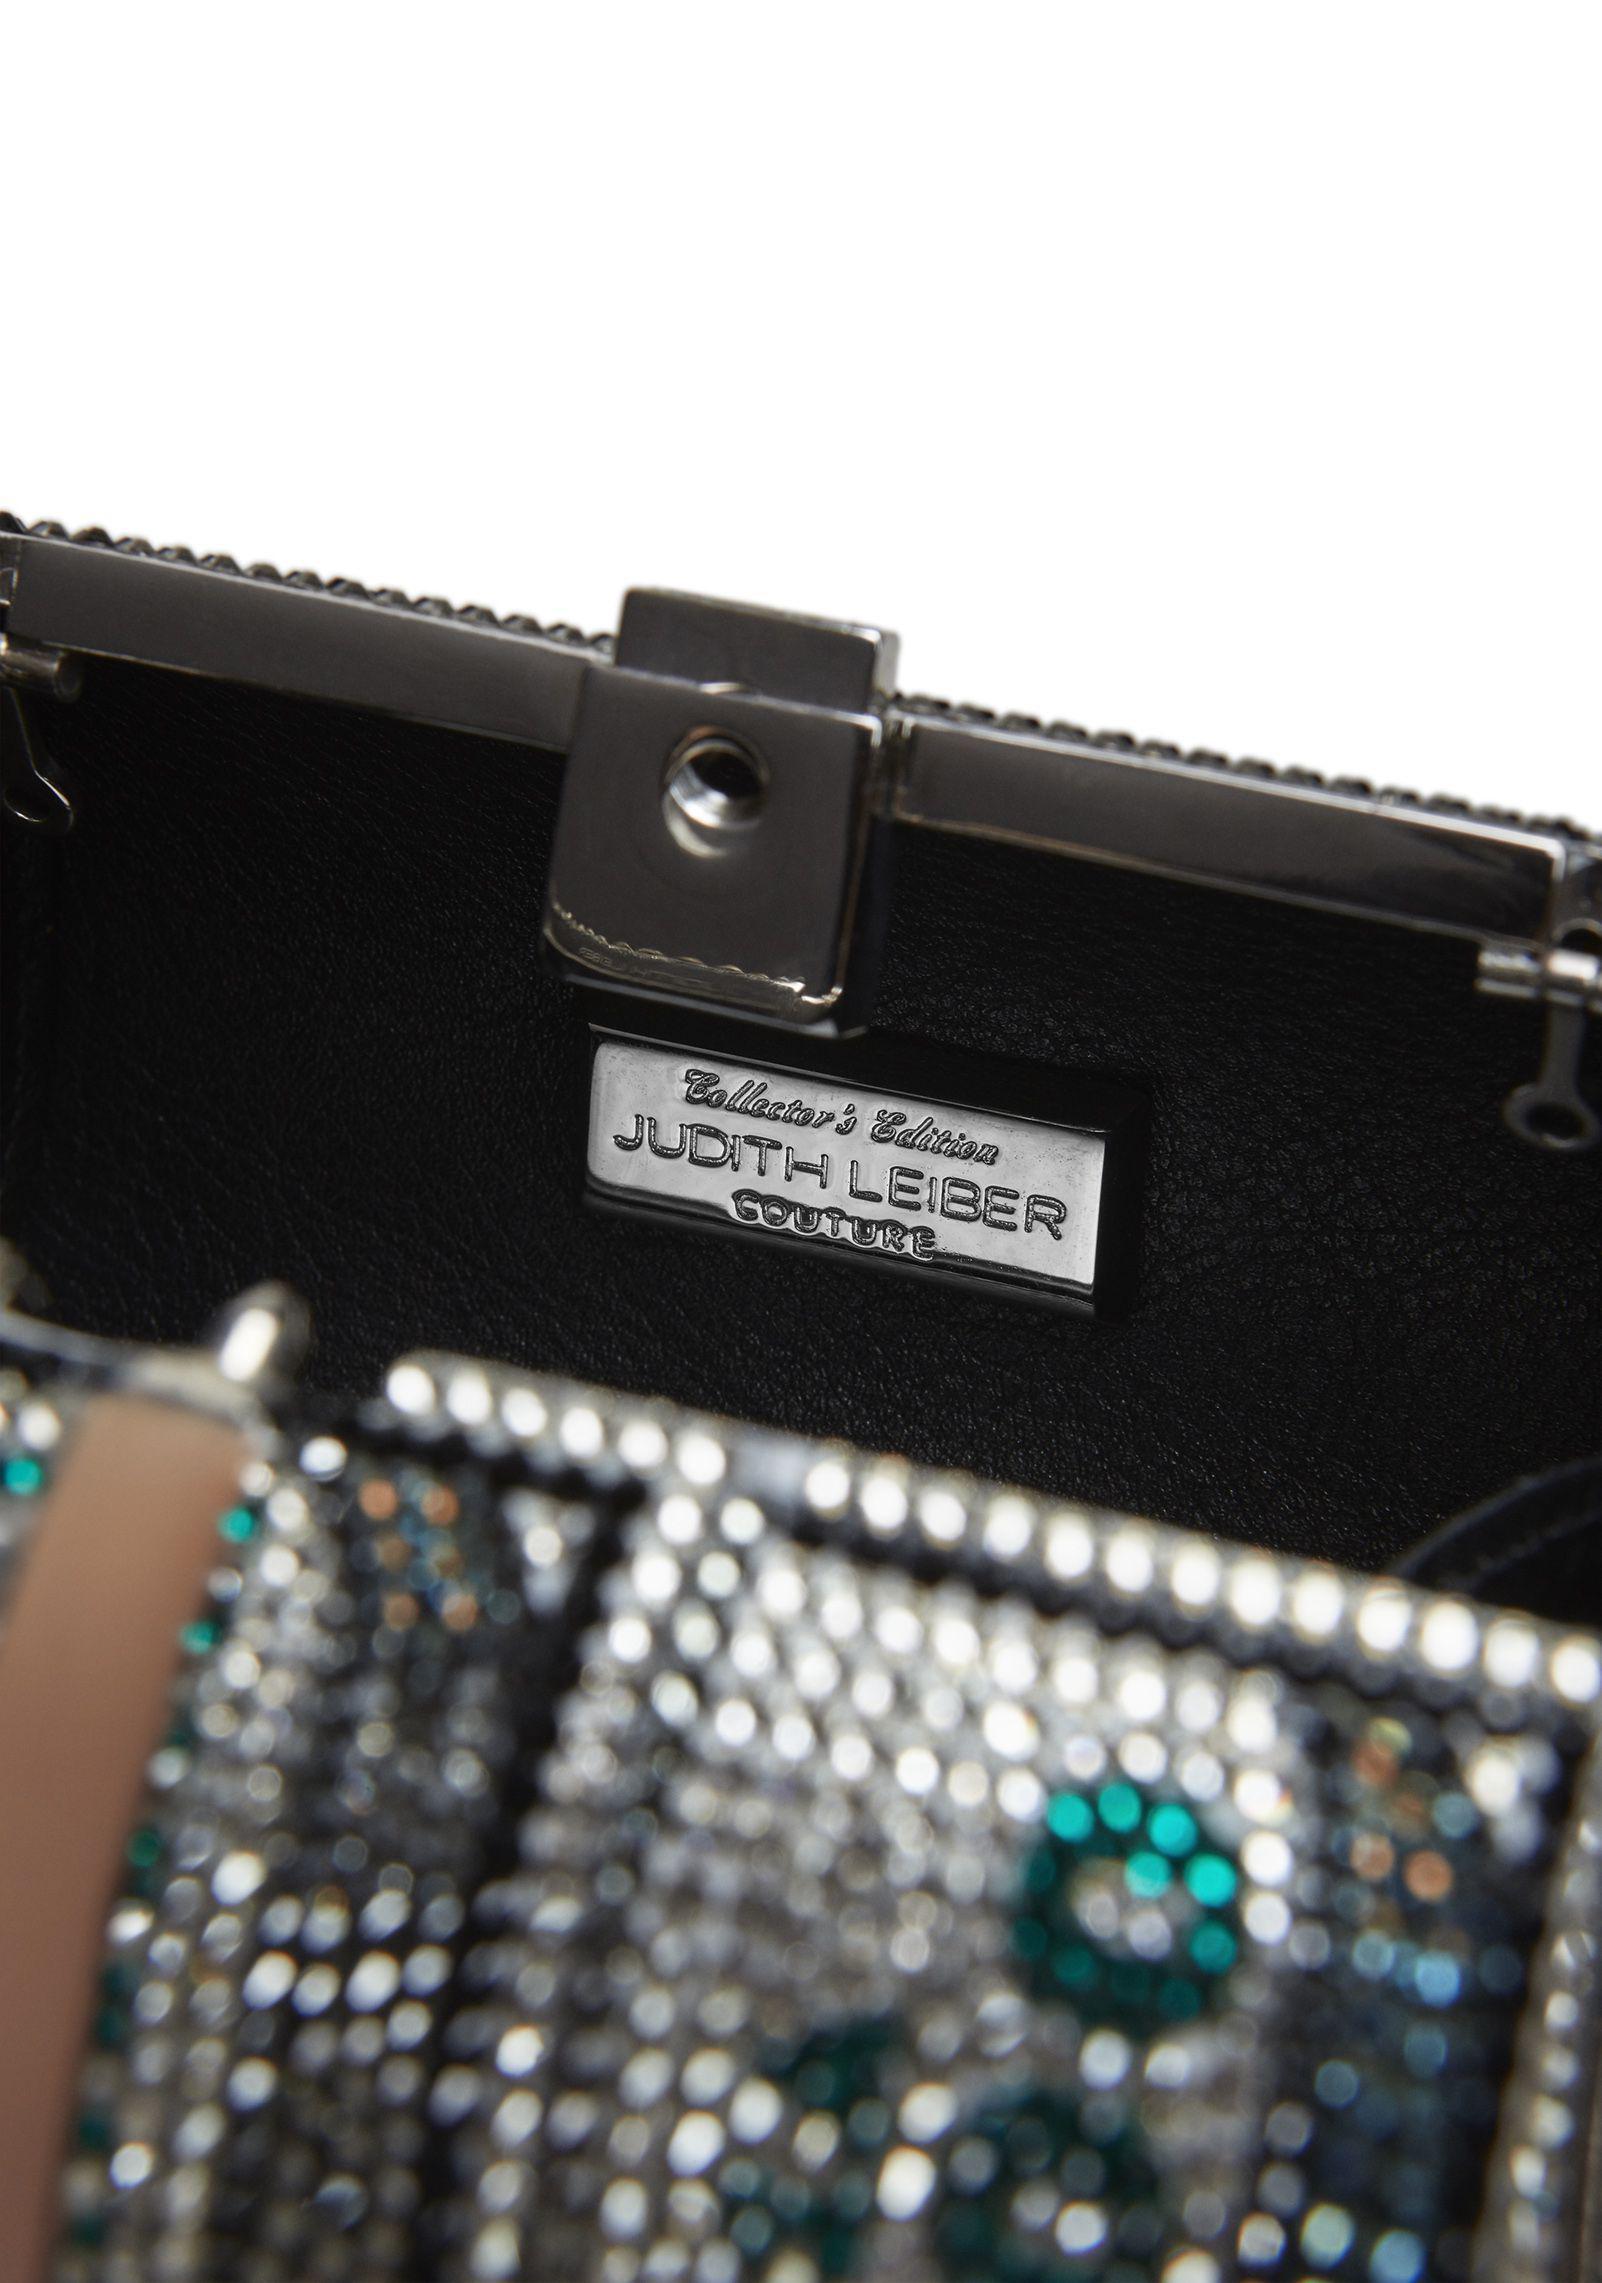 22db26116 Alexander Wang Judith Leiber X Bag in Metallic - Lyst